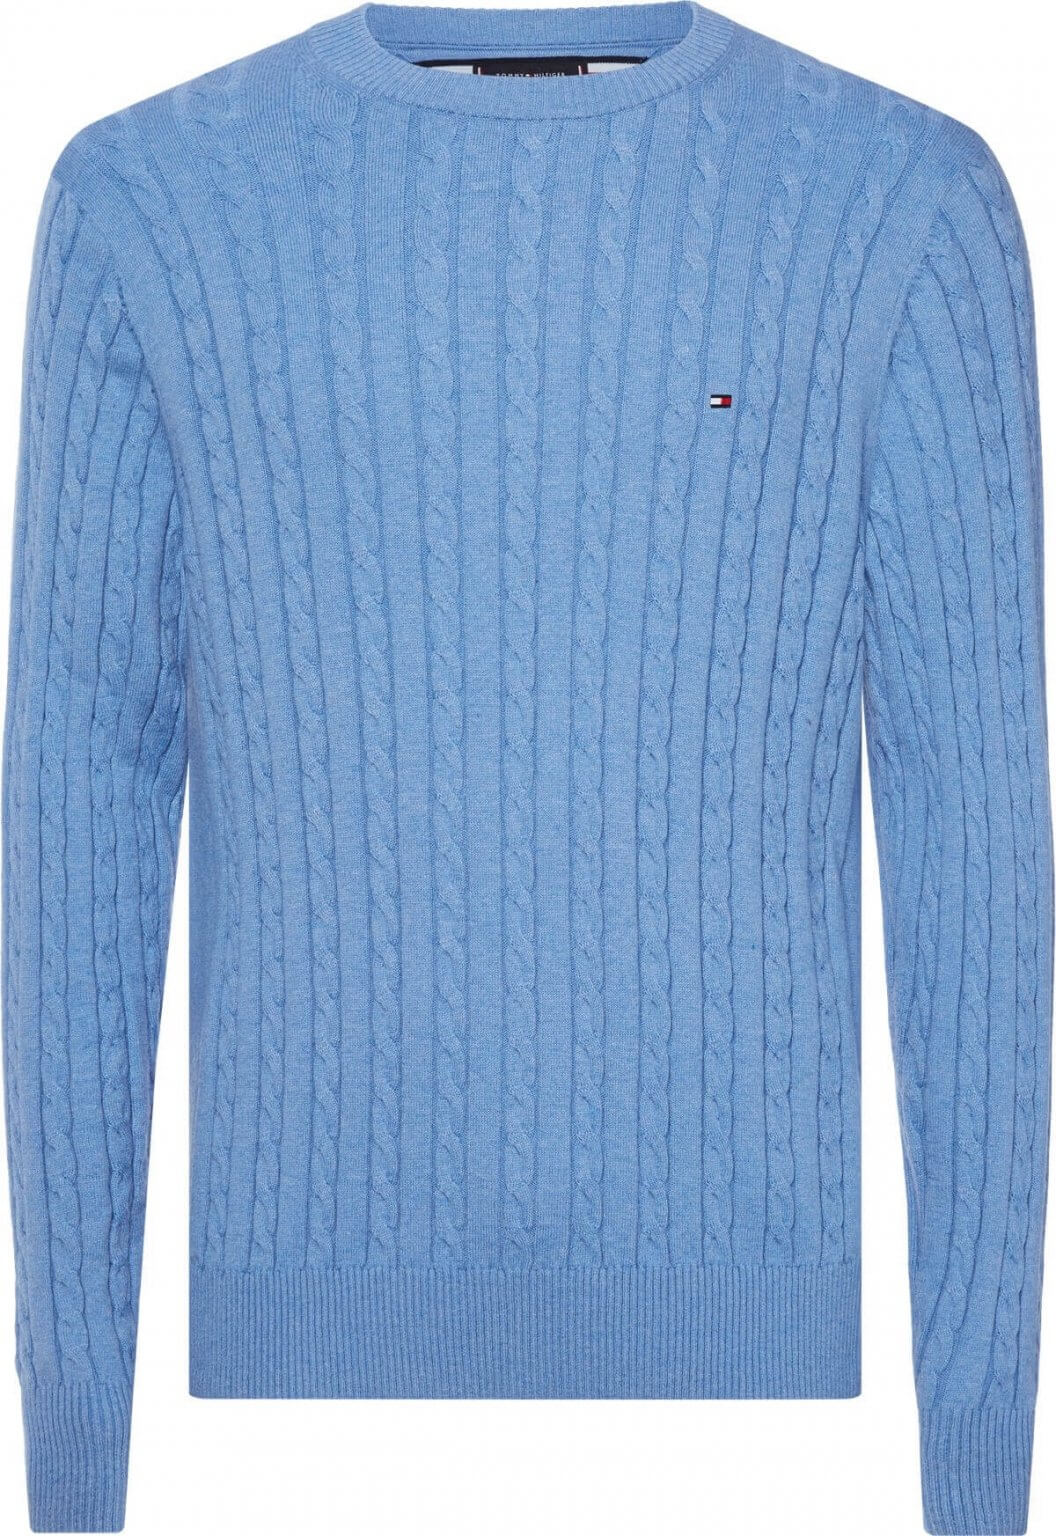 Tommy Hilfiger Knitted Jumper | Davids Of Haslemere